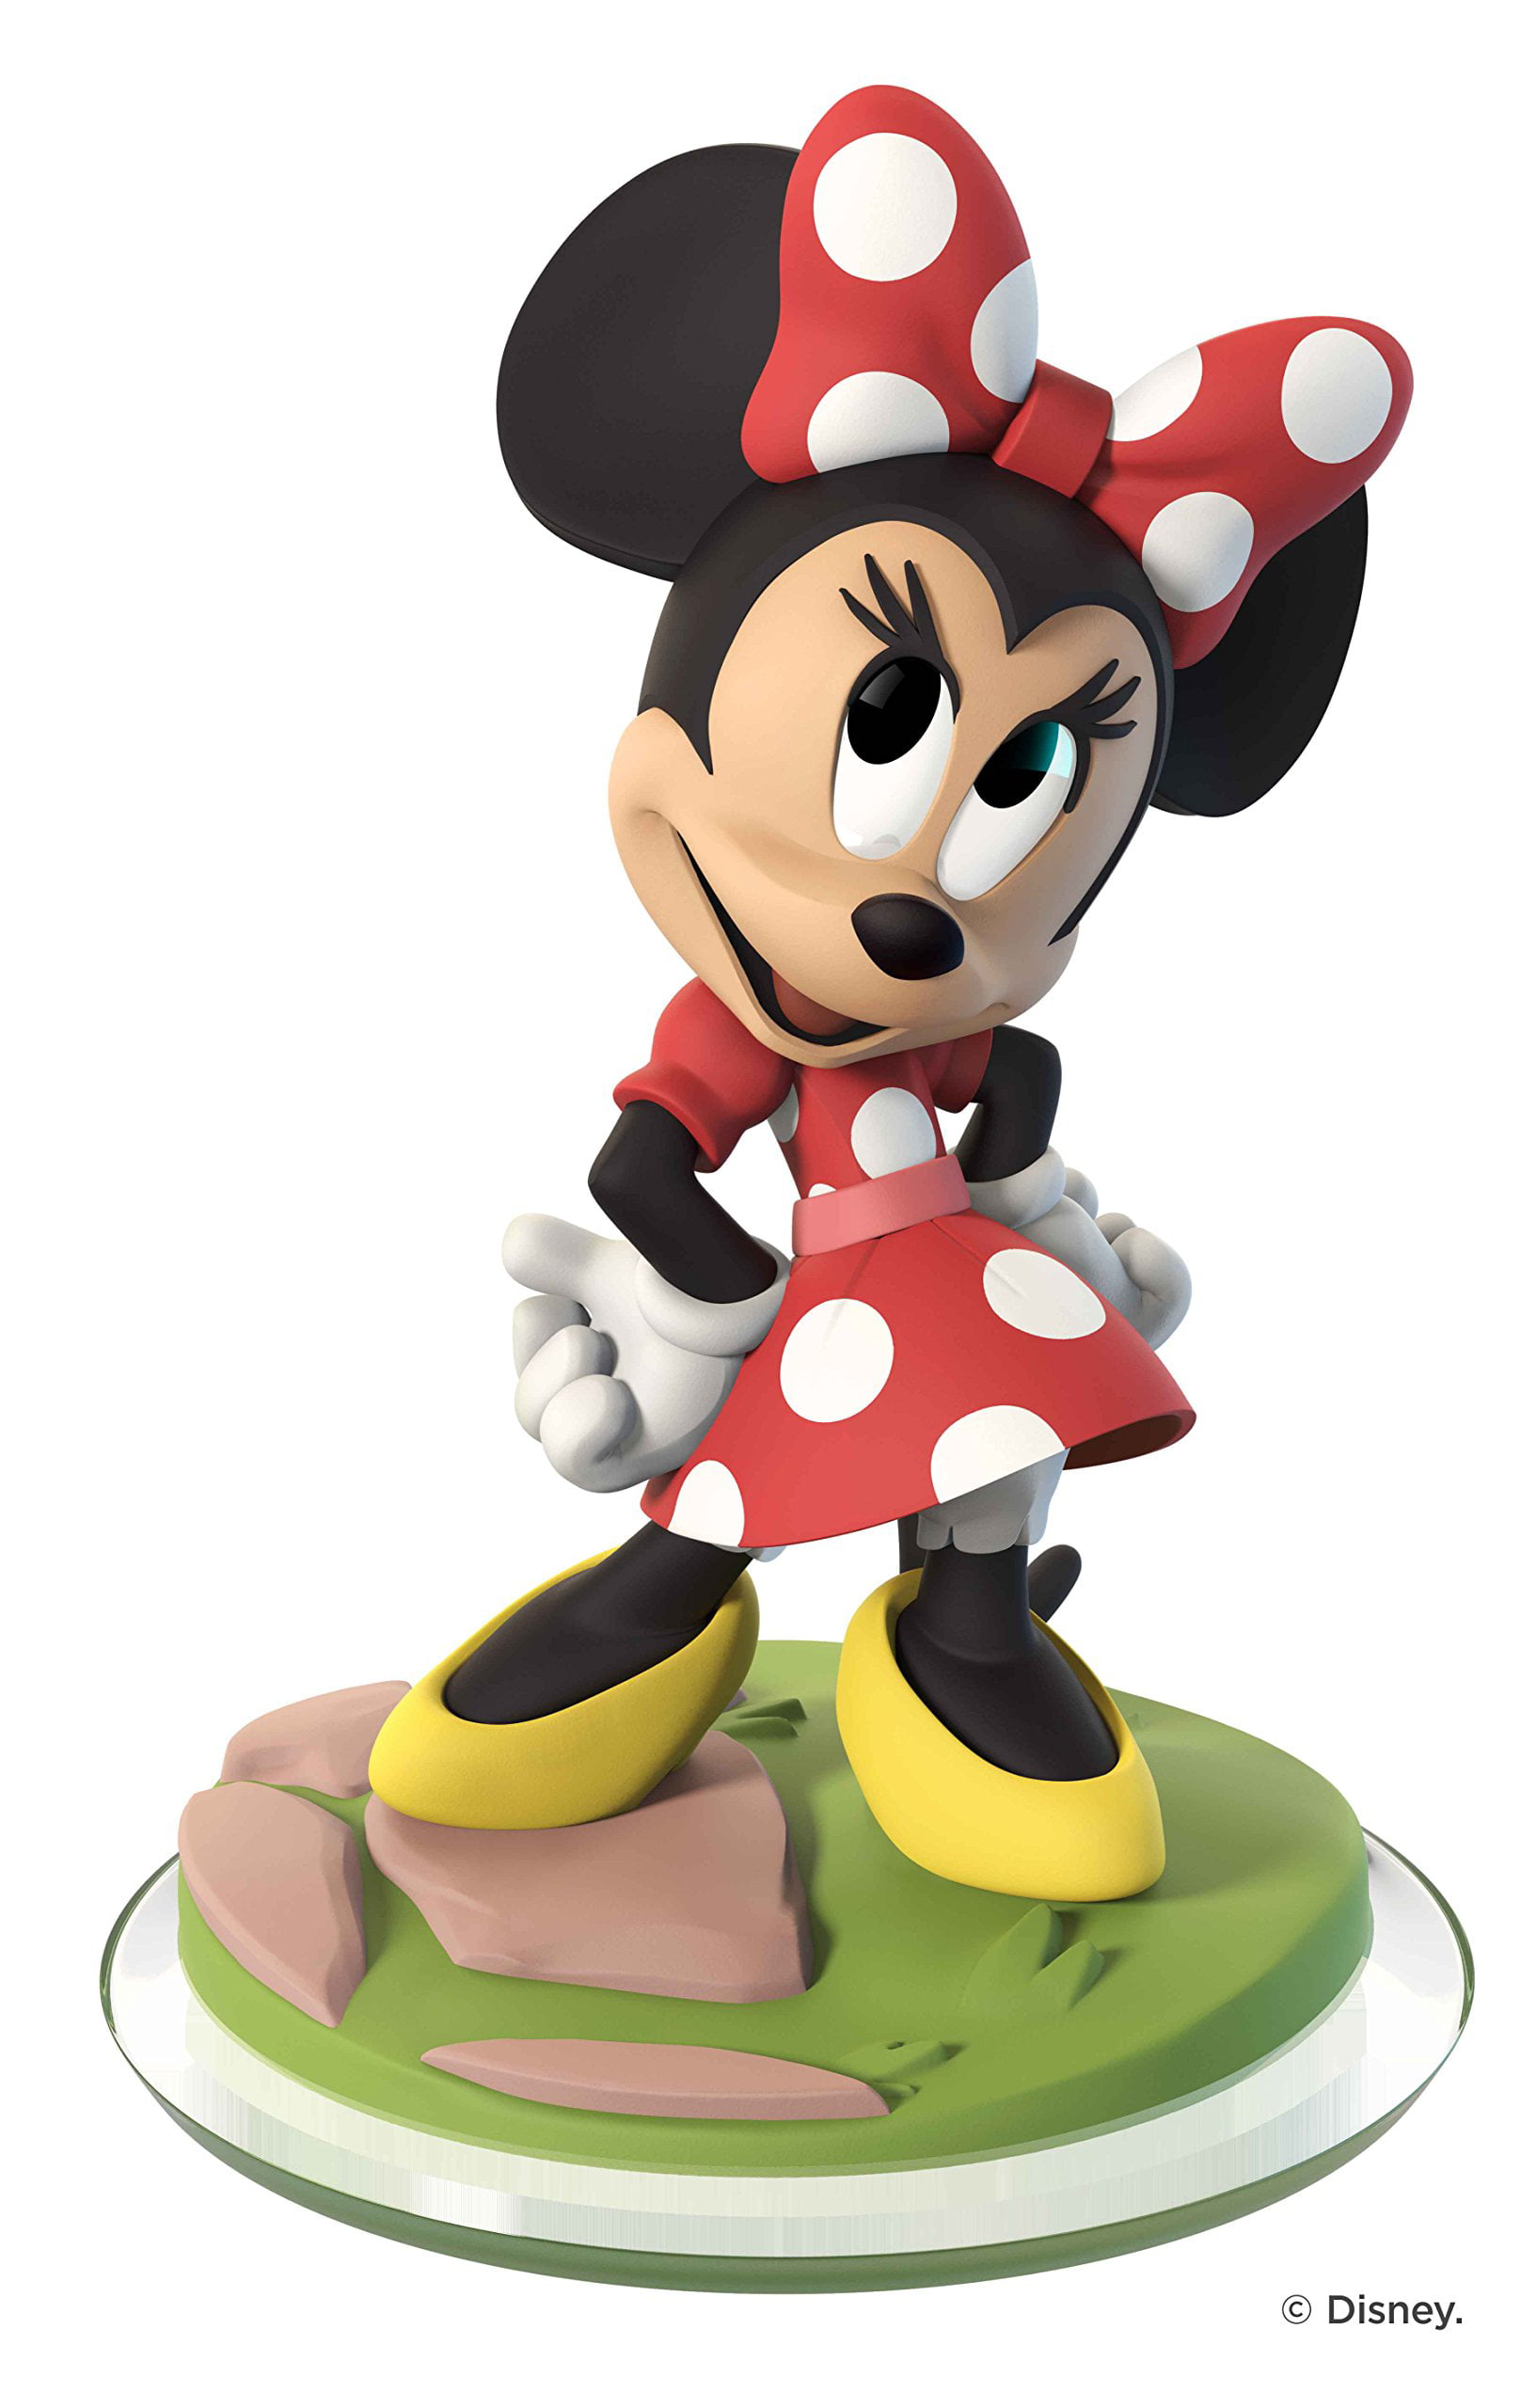 Clipart Minnie Disney The Magic Girl Digital Scrapbook Kit Minnie Mouse